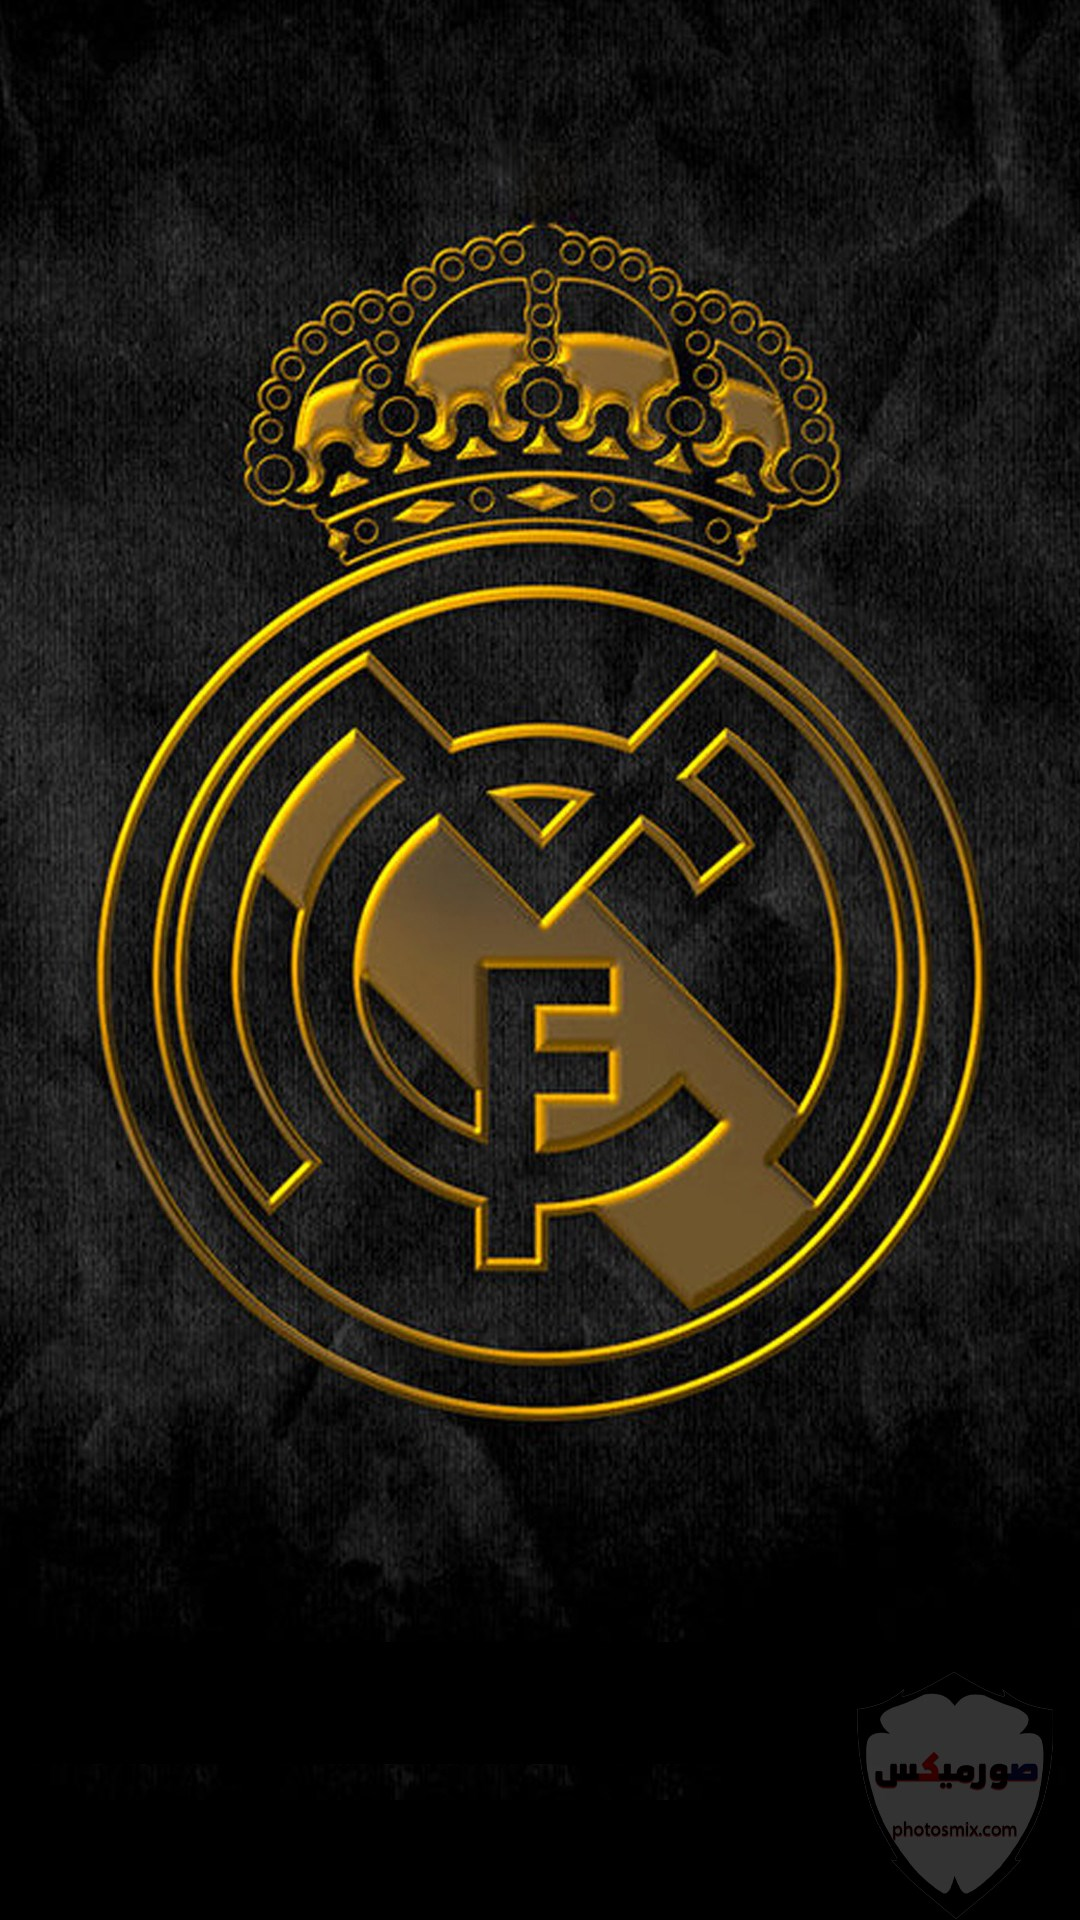 صور ريال مدريد 2020خلفيات ورمزيات ريال مدريد صور لاعبي ريال مدريد real madrid 43